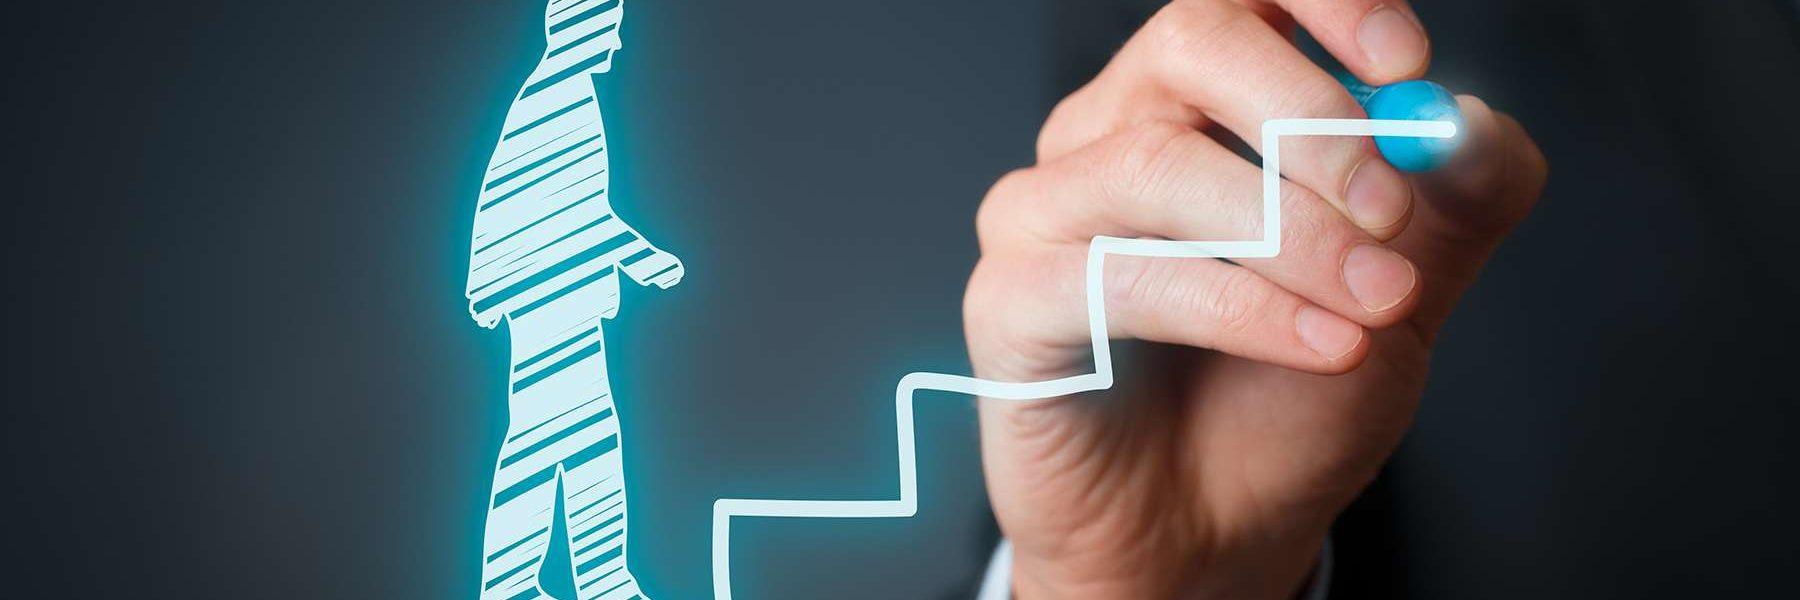 Network Marketing Belief- The Deeper Your Belief the Greater the Chance of Network Marketing Success